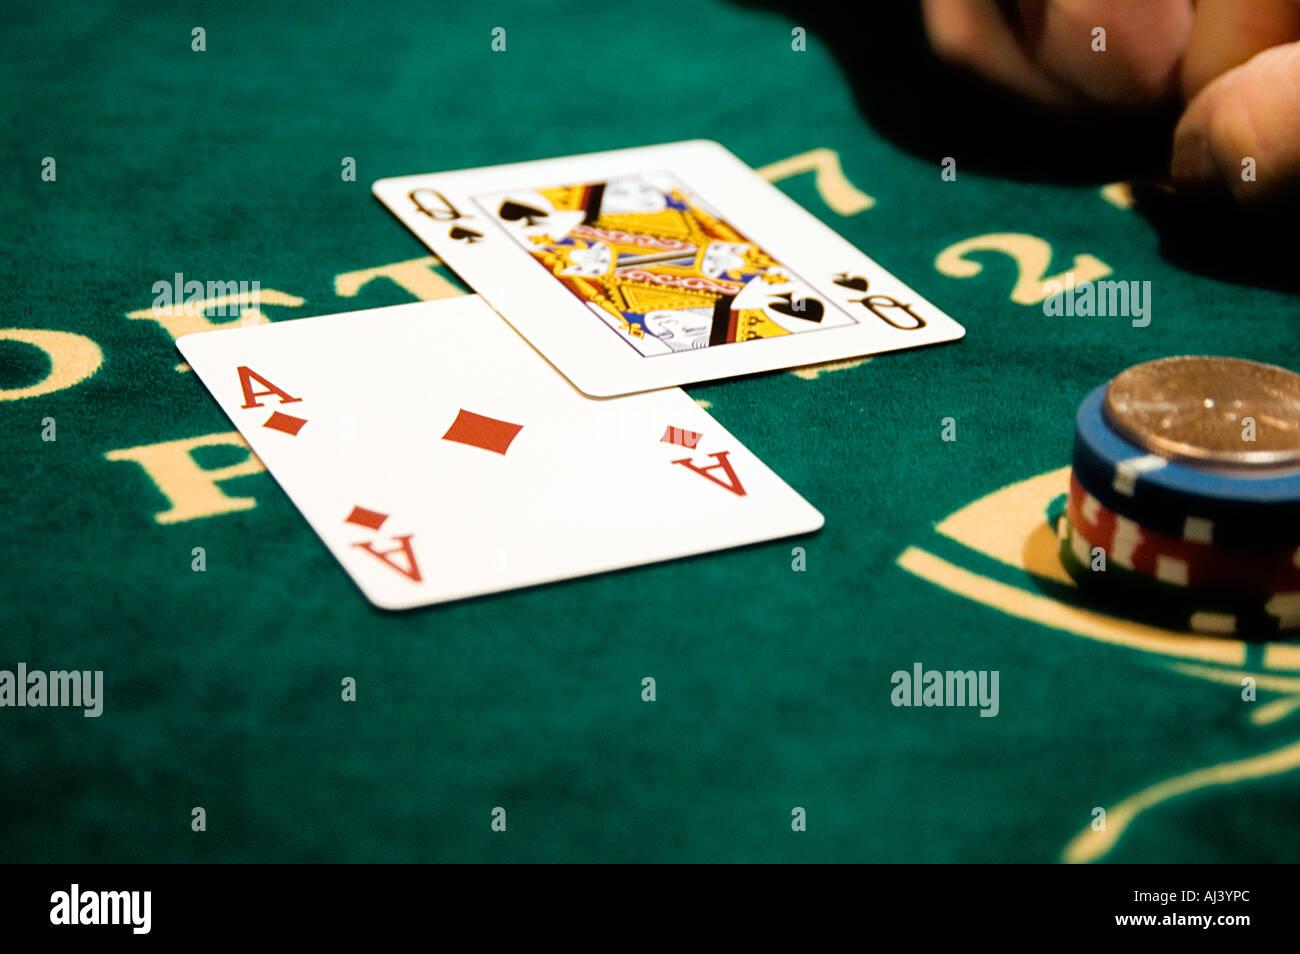 Winning Black Jack hand - Stock Image